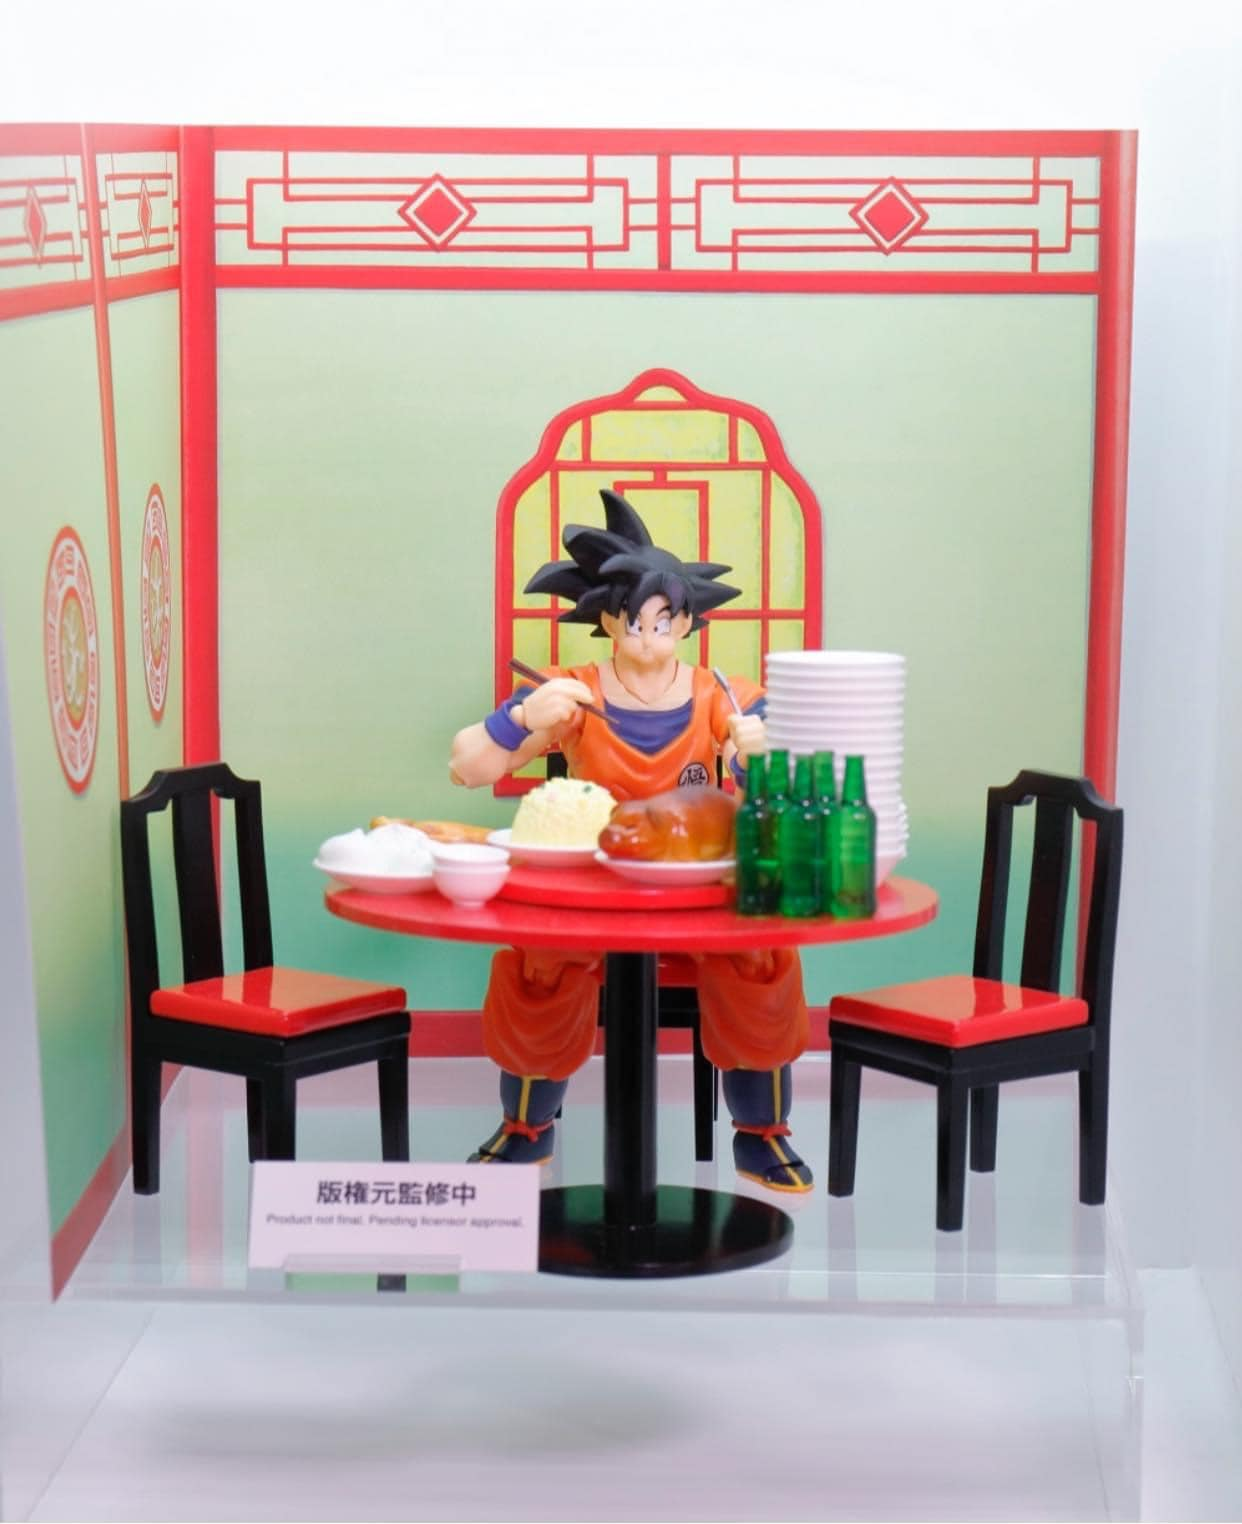 [Comentários] Tamashii Nations 2020 Figure Museum 4Vog4n7N_o